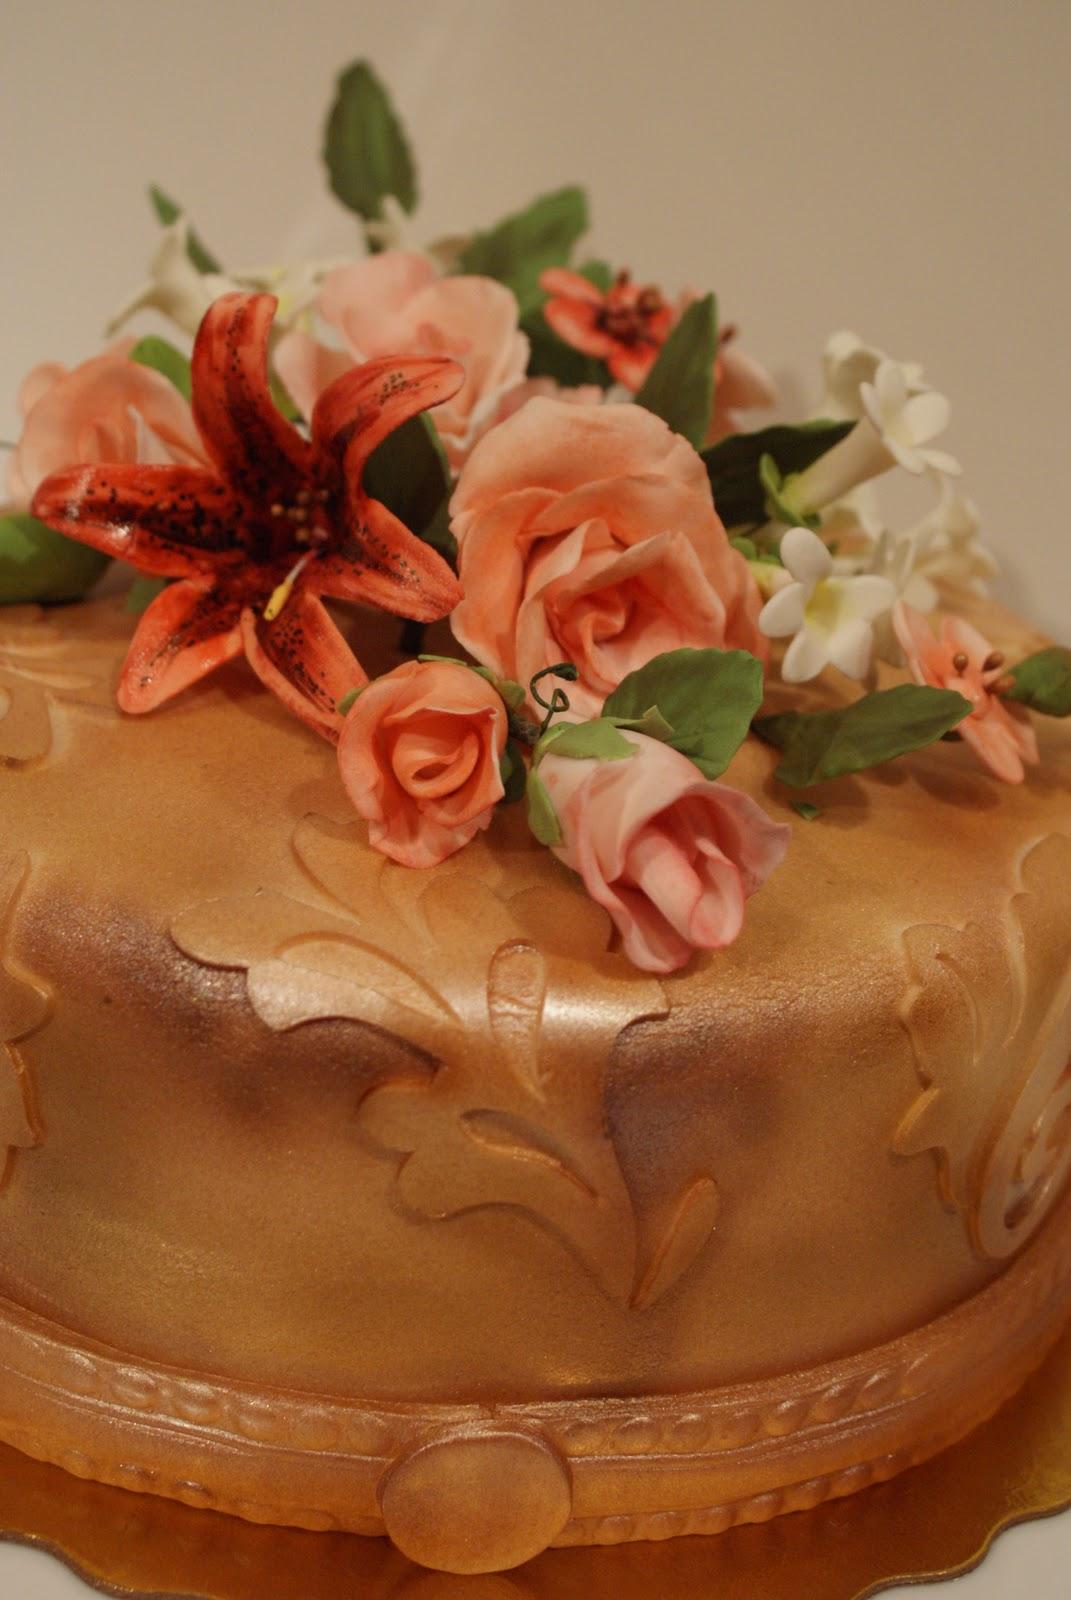 A keen cake impression december 2010 - Impression gateau ...